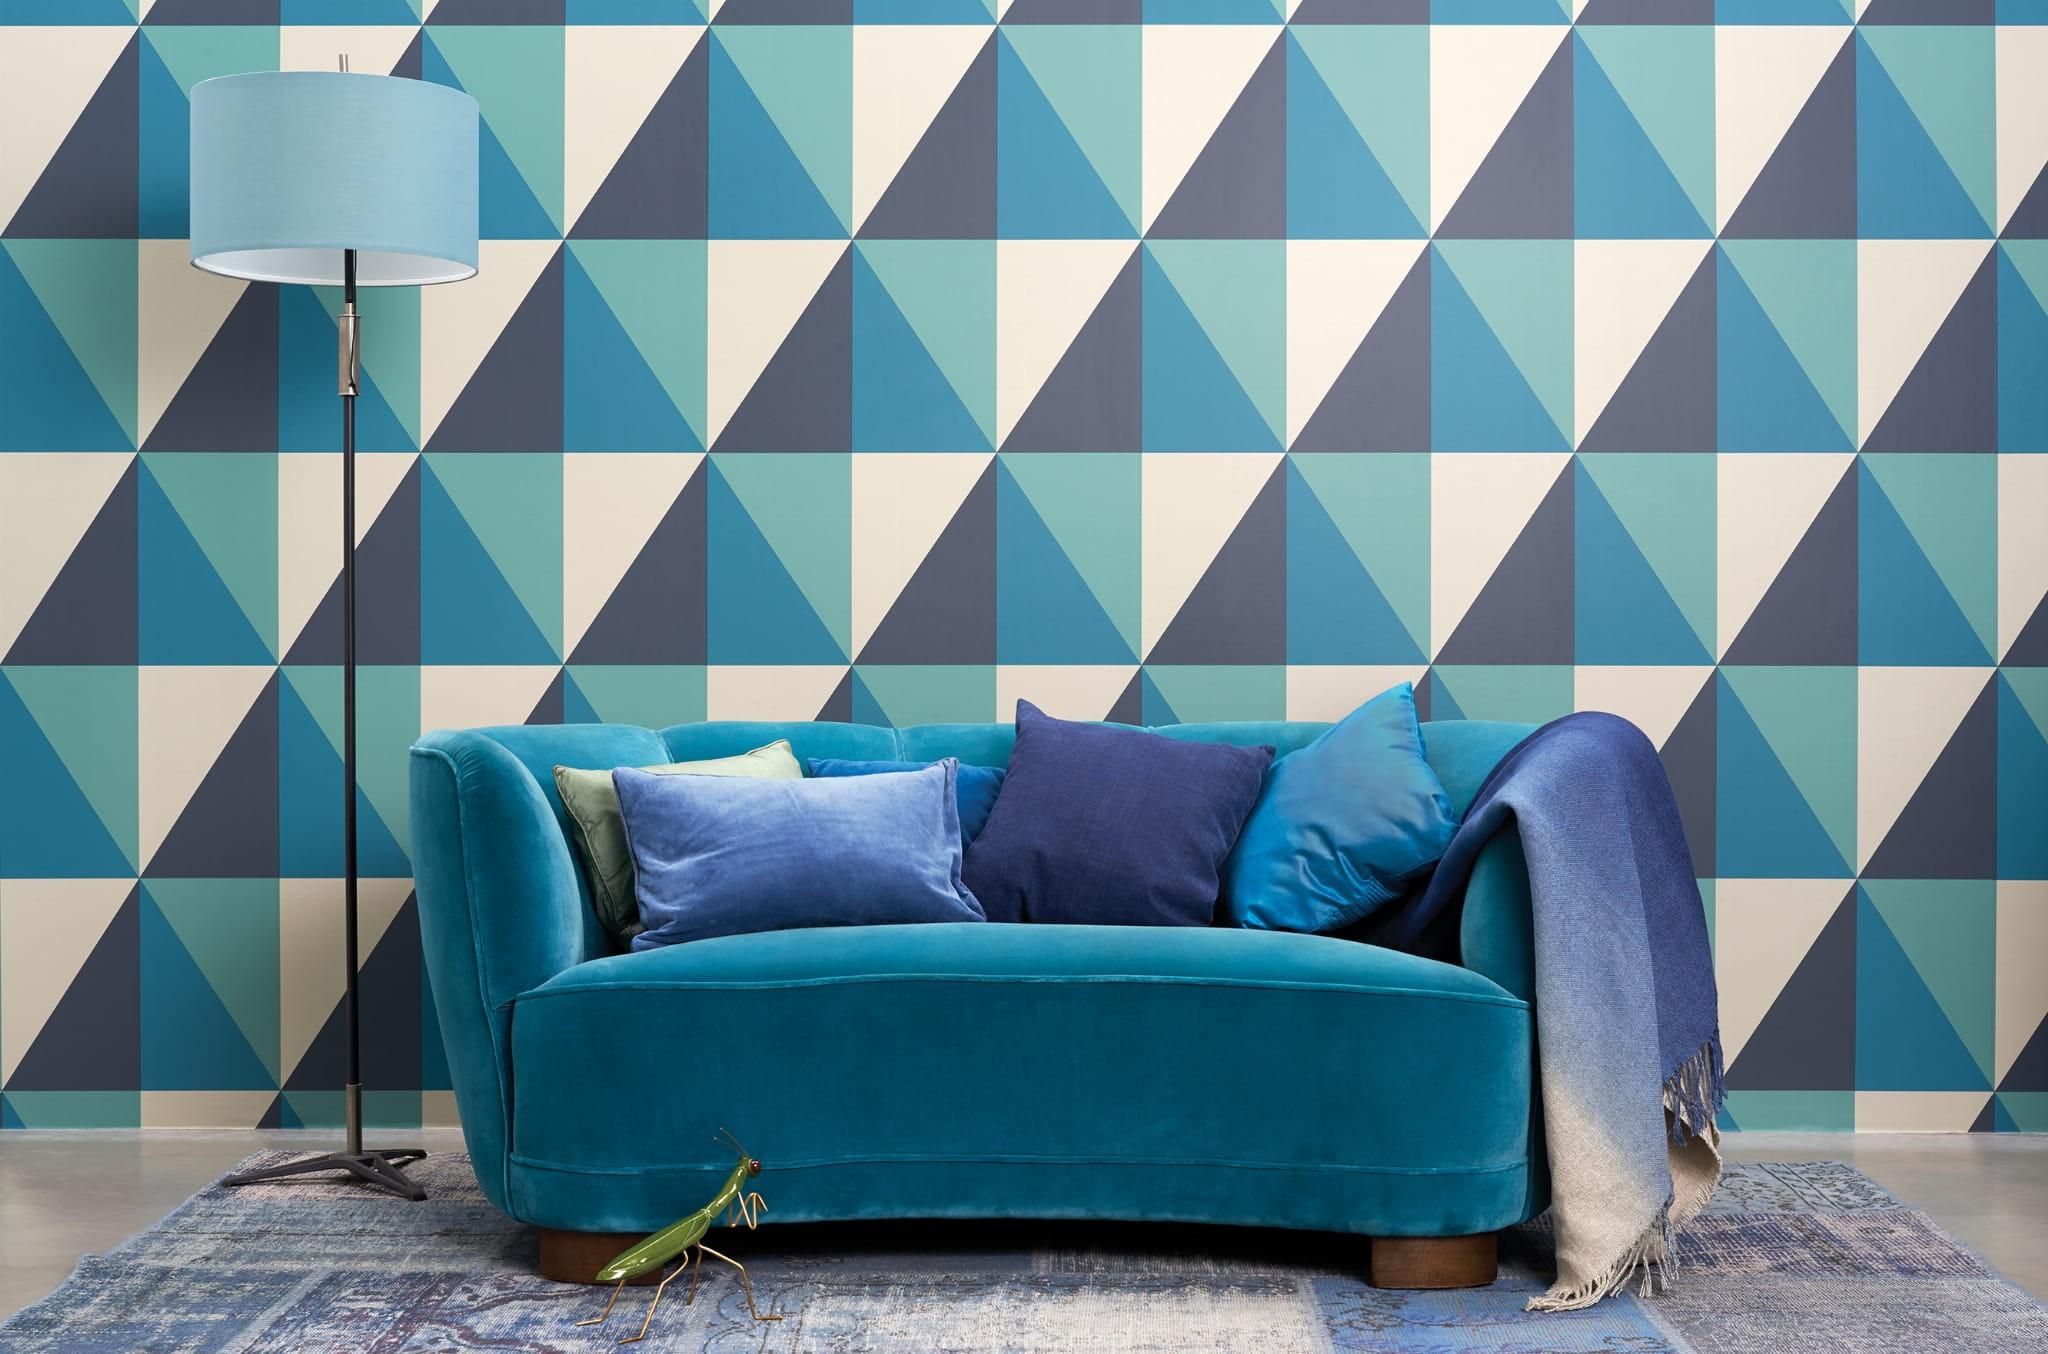 105 10041 tapeta geometric ii cole son bella arte ekskluzywne tapety cienne. Black Bedroom Furniture Sets. Home Design Ideas